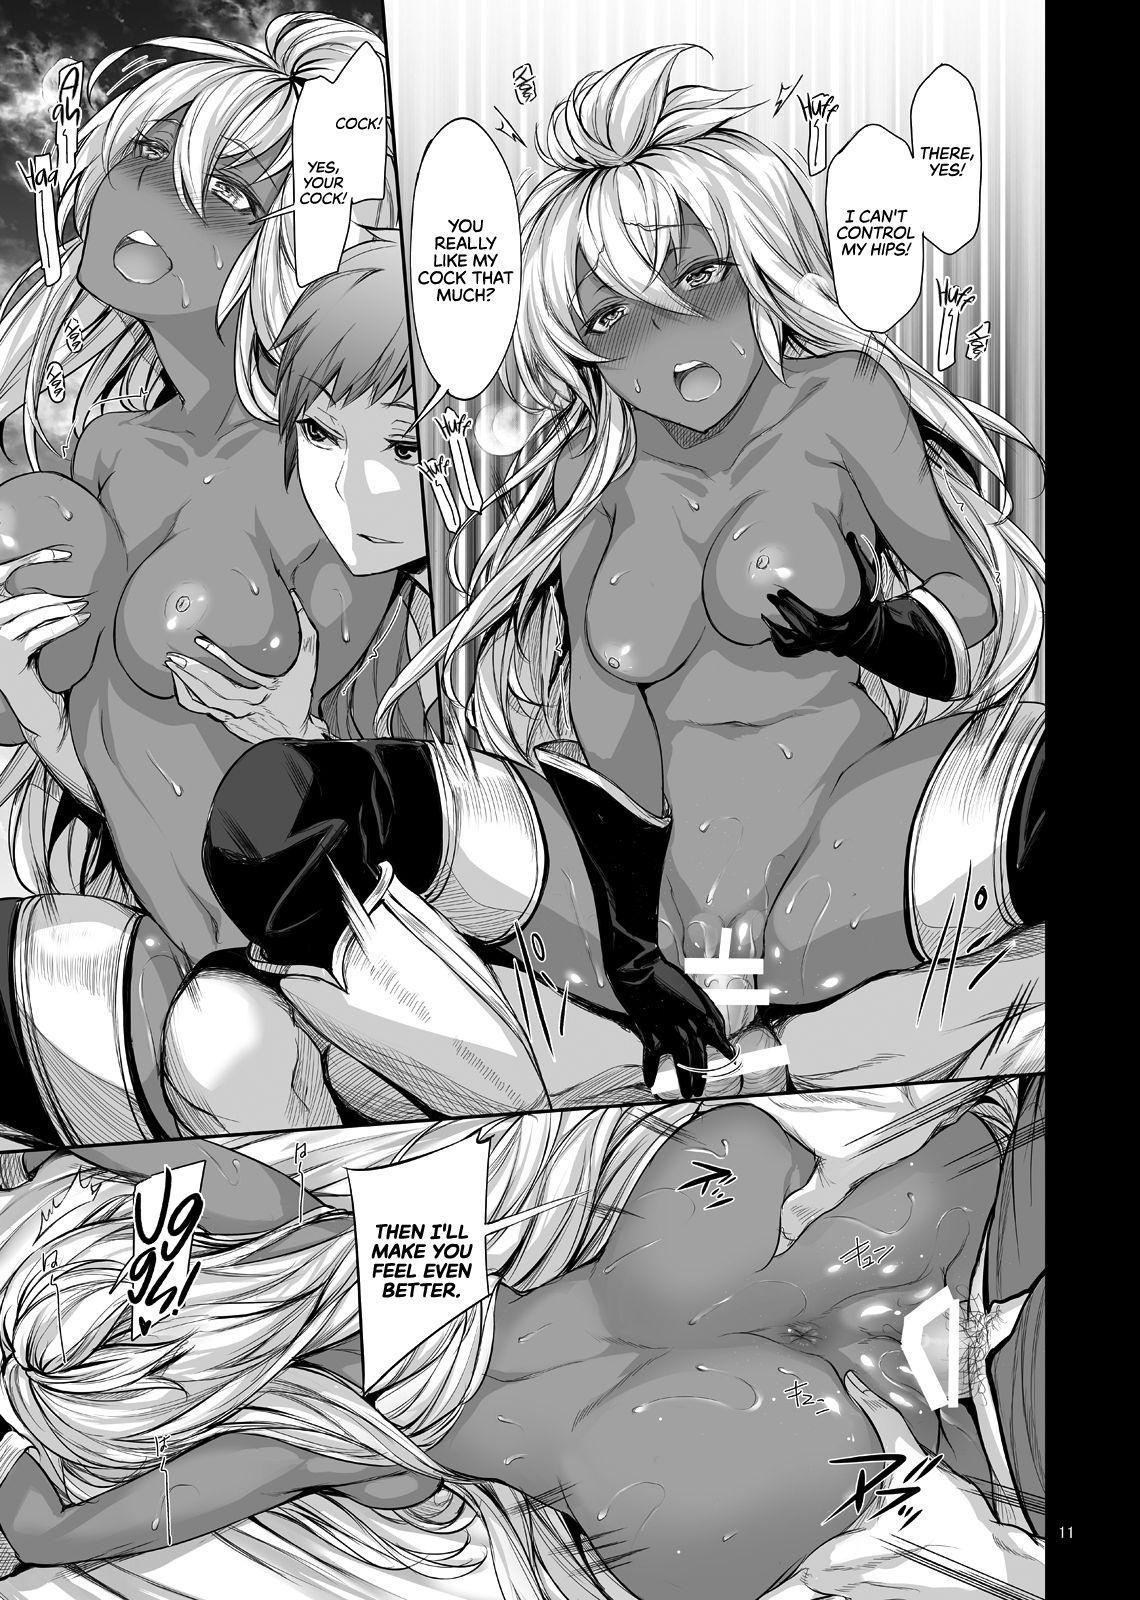 [Gentsuki Okiba (Gentsuki)] Zooey-chan to Nakayoku Shiyou | Cum Along with Zooey-chan (Granblue Fantasy) [English] [EHCOVE] [Digital] 12